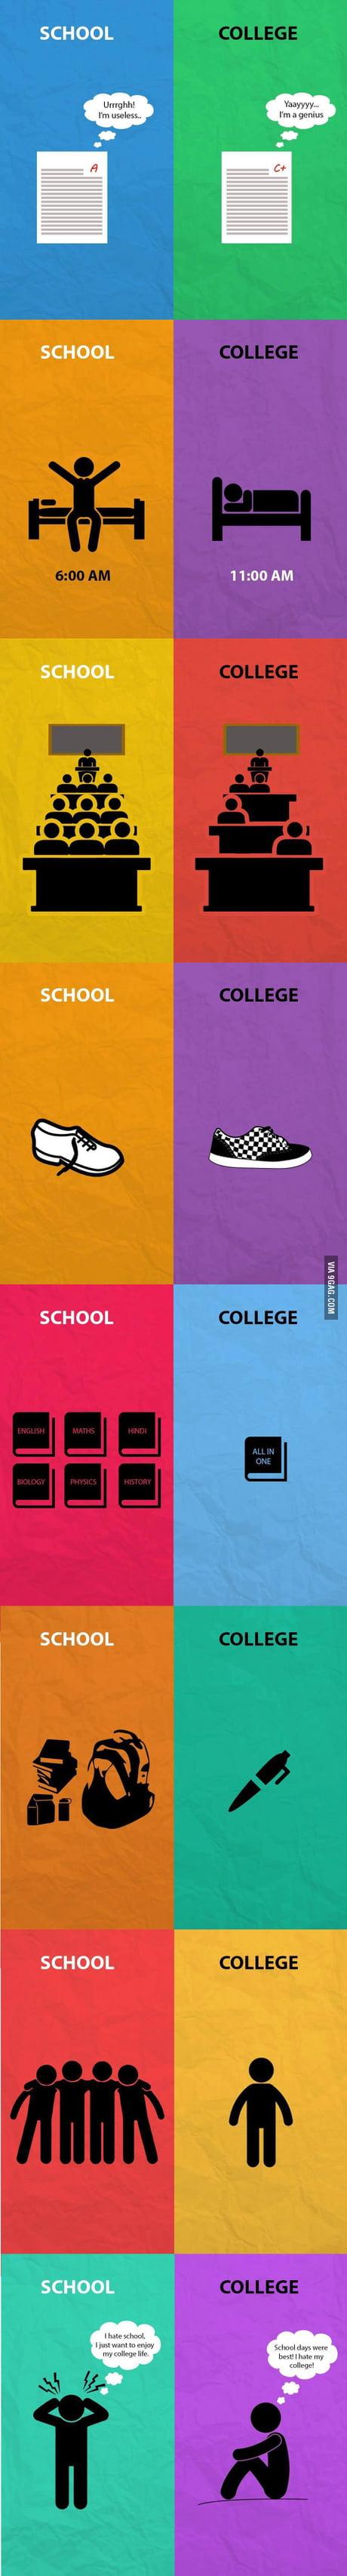 school life vs college life accurately explained in simple school life vs college life accurately explained in simple graphics